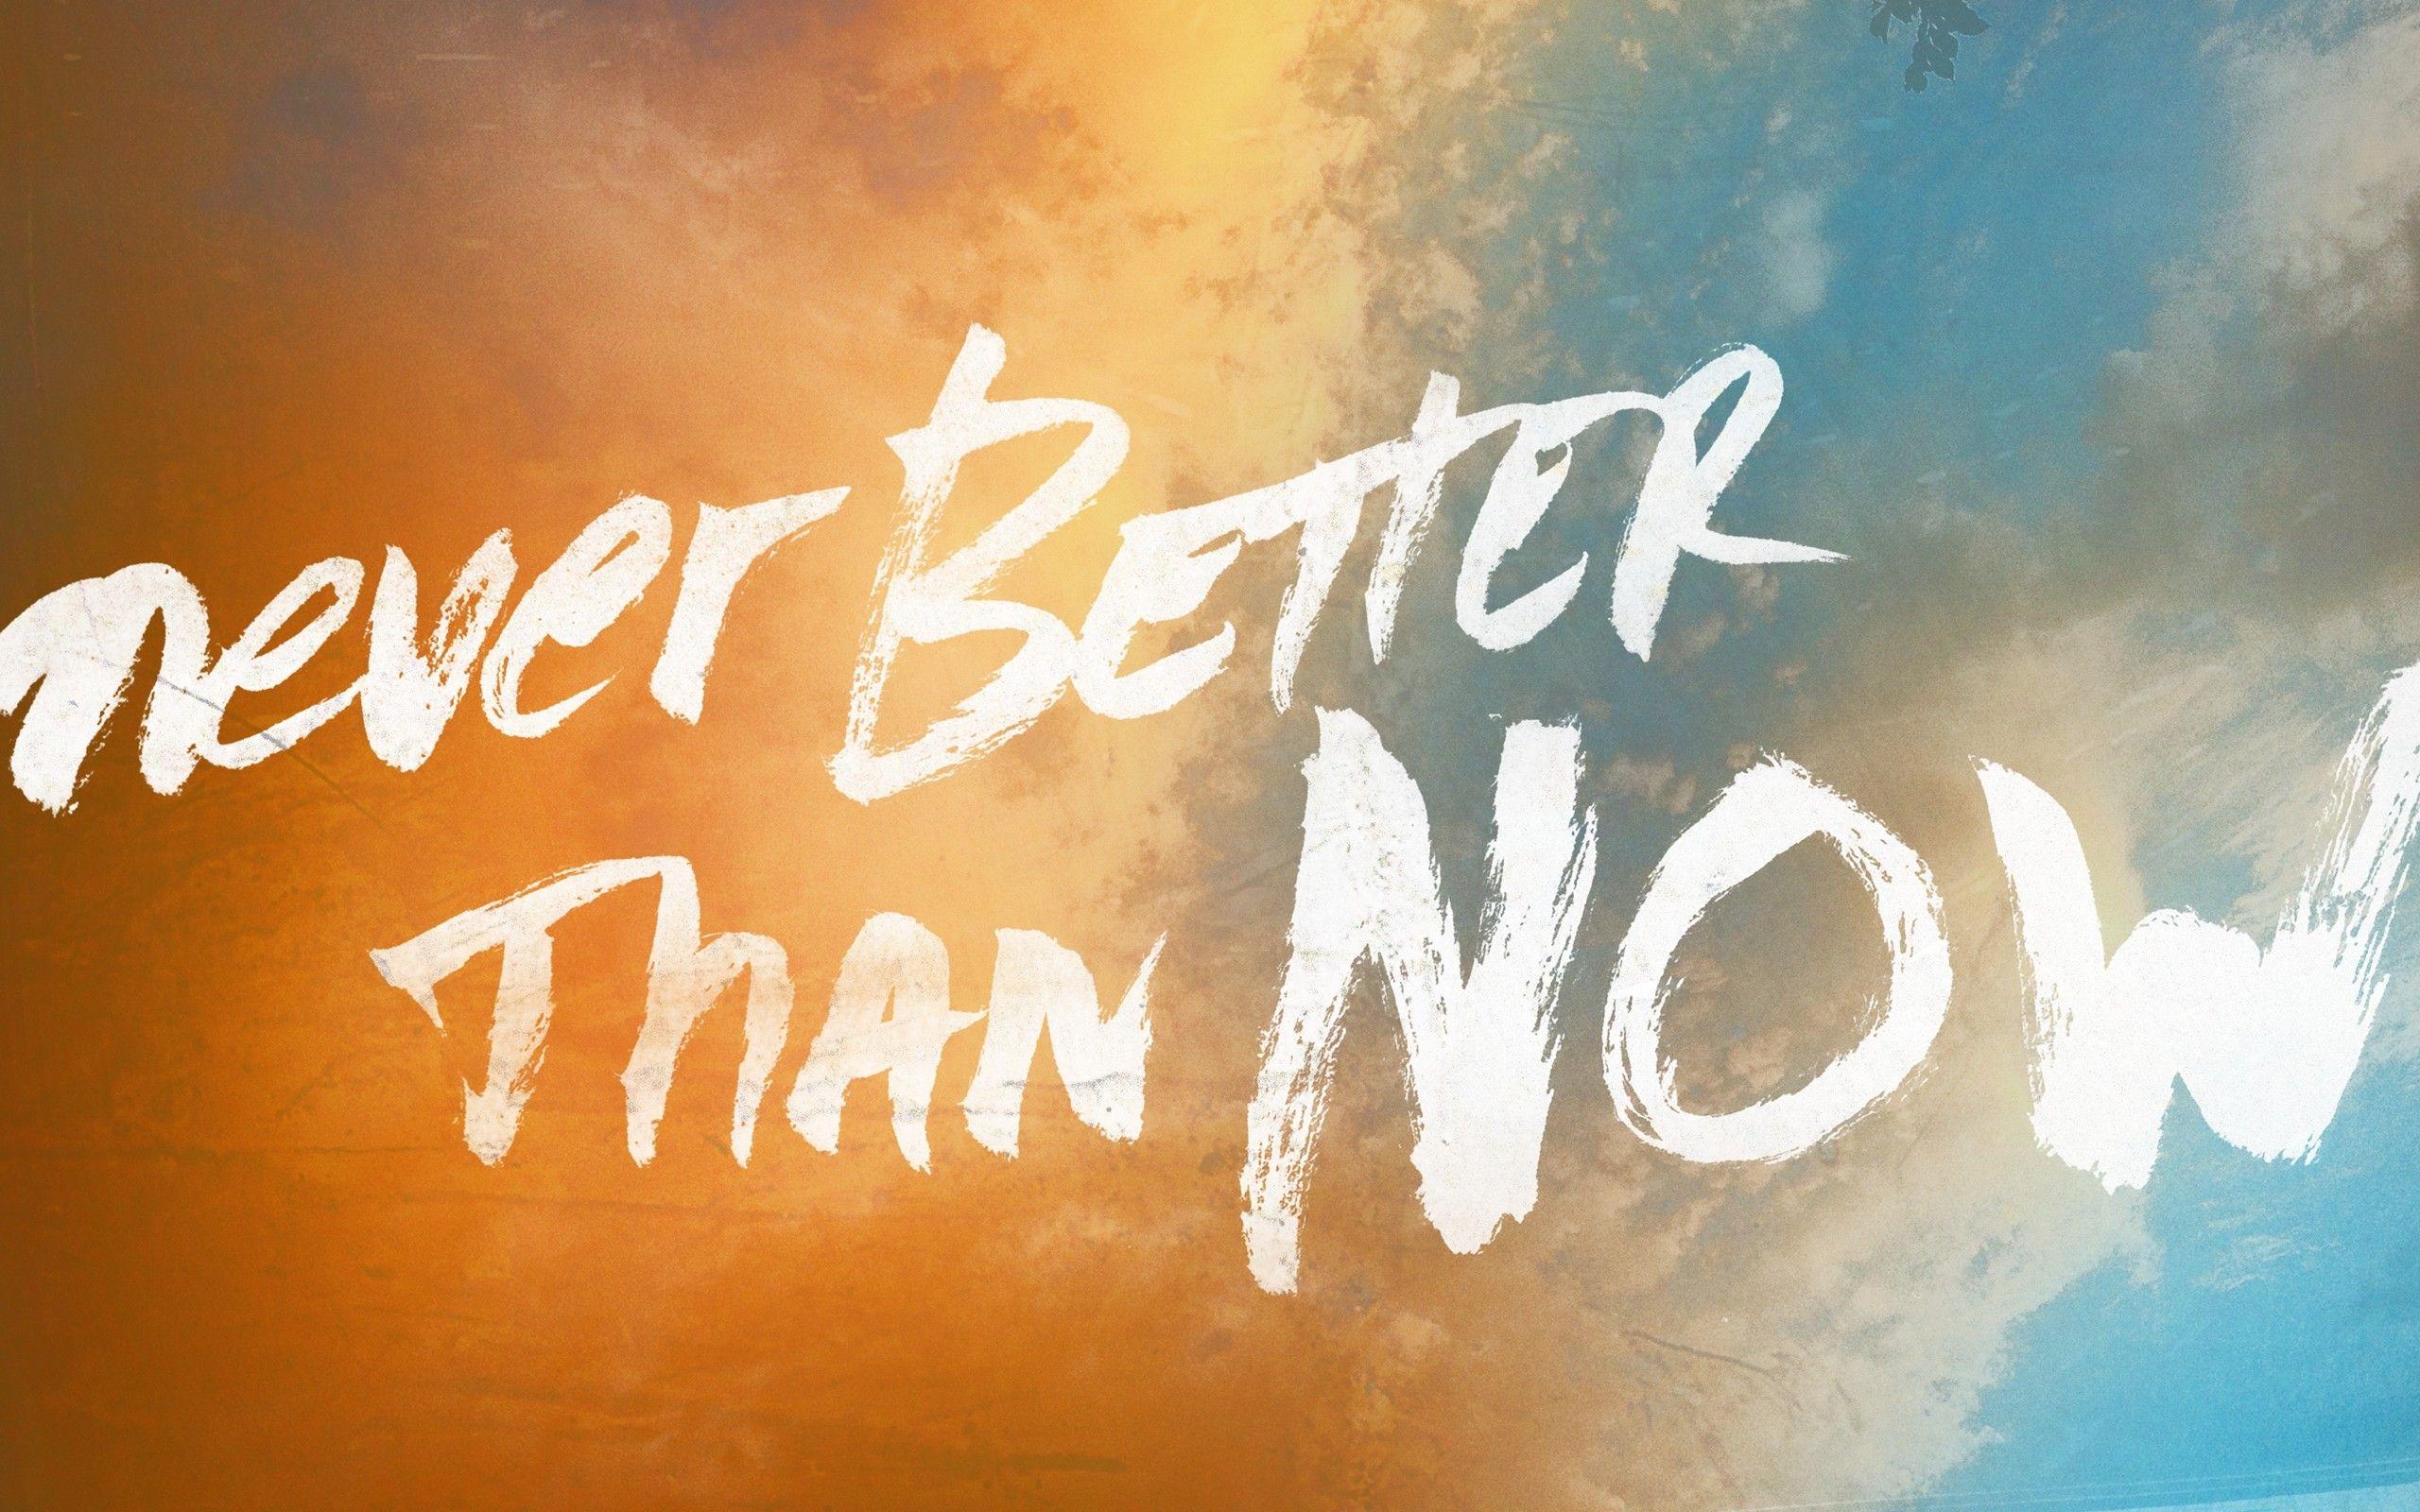 Hd wallpaper motivational - Interesting More 55 Motivational Wallpaper Orange